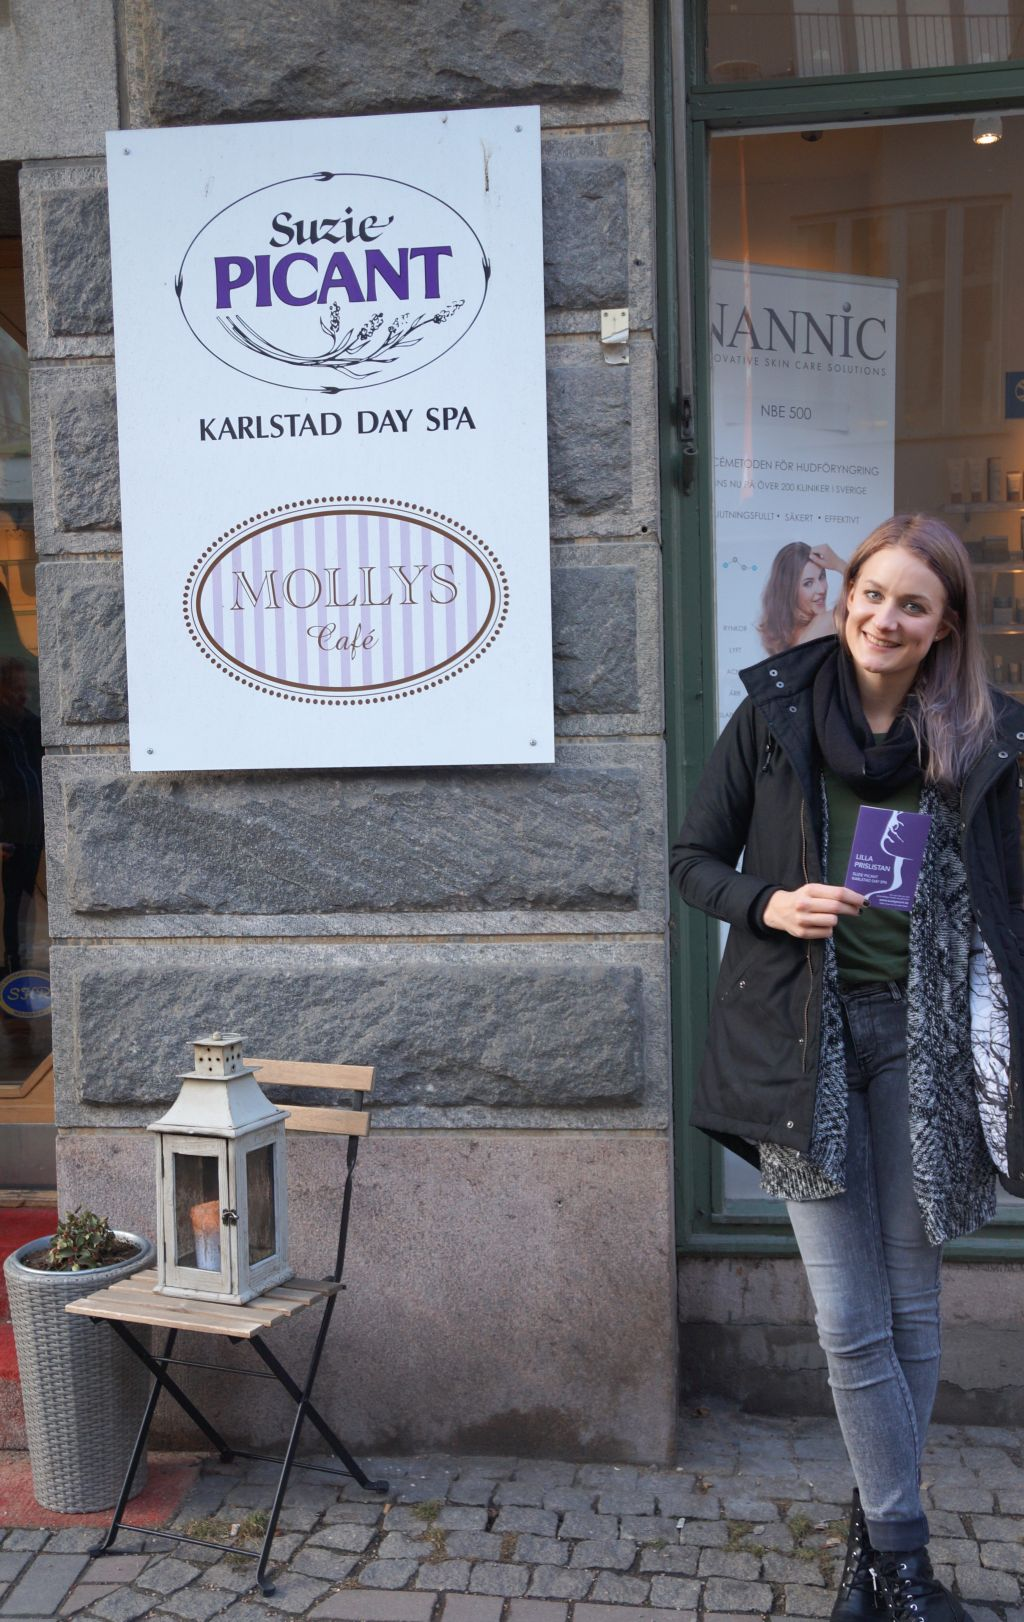 Norway Chat Room Escort Netherland